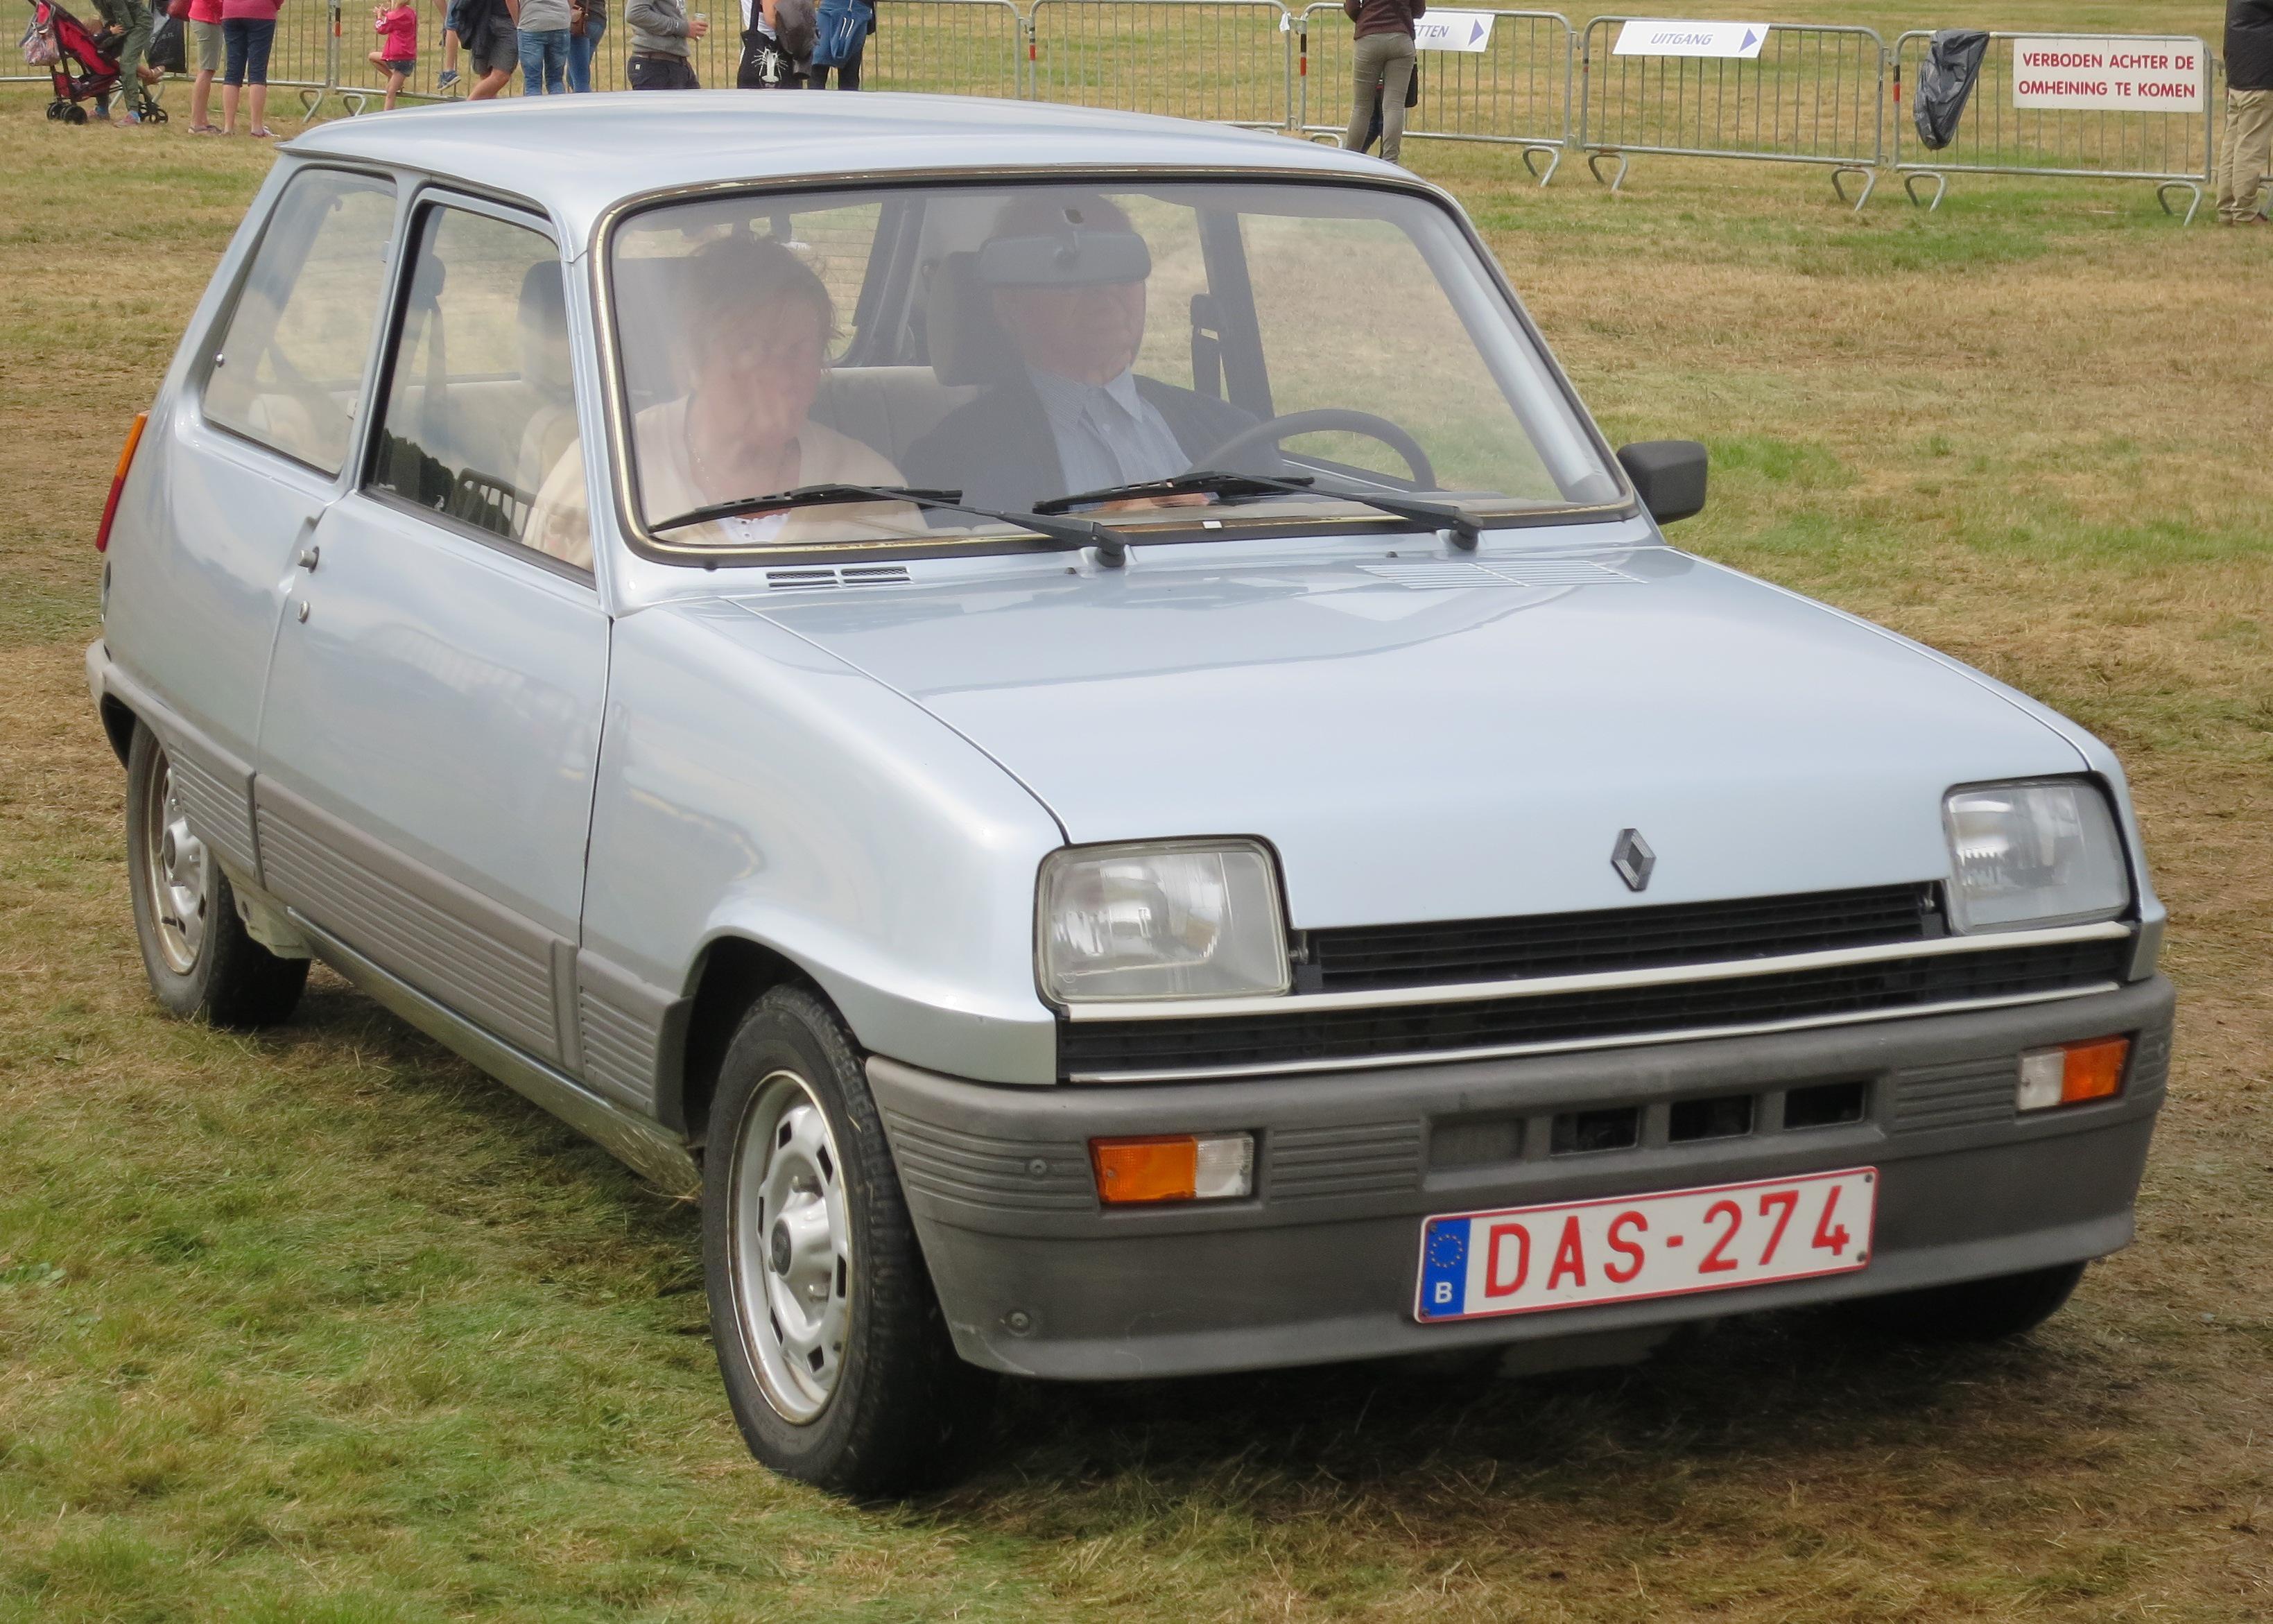 Description Of An Old Car